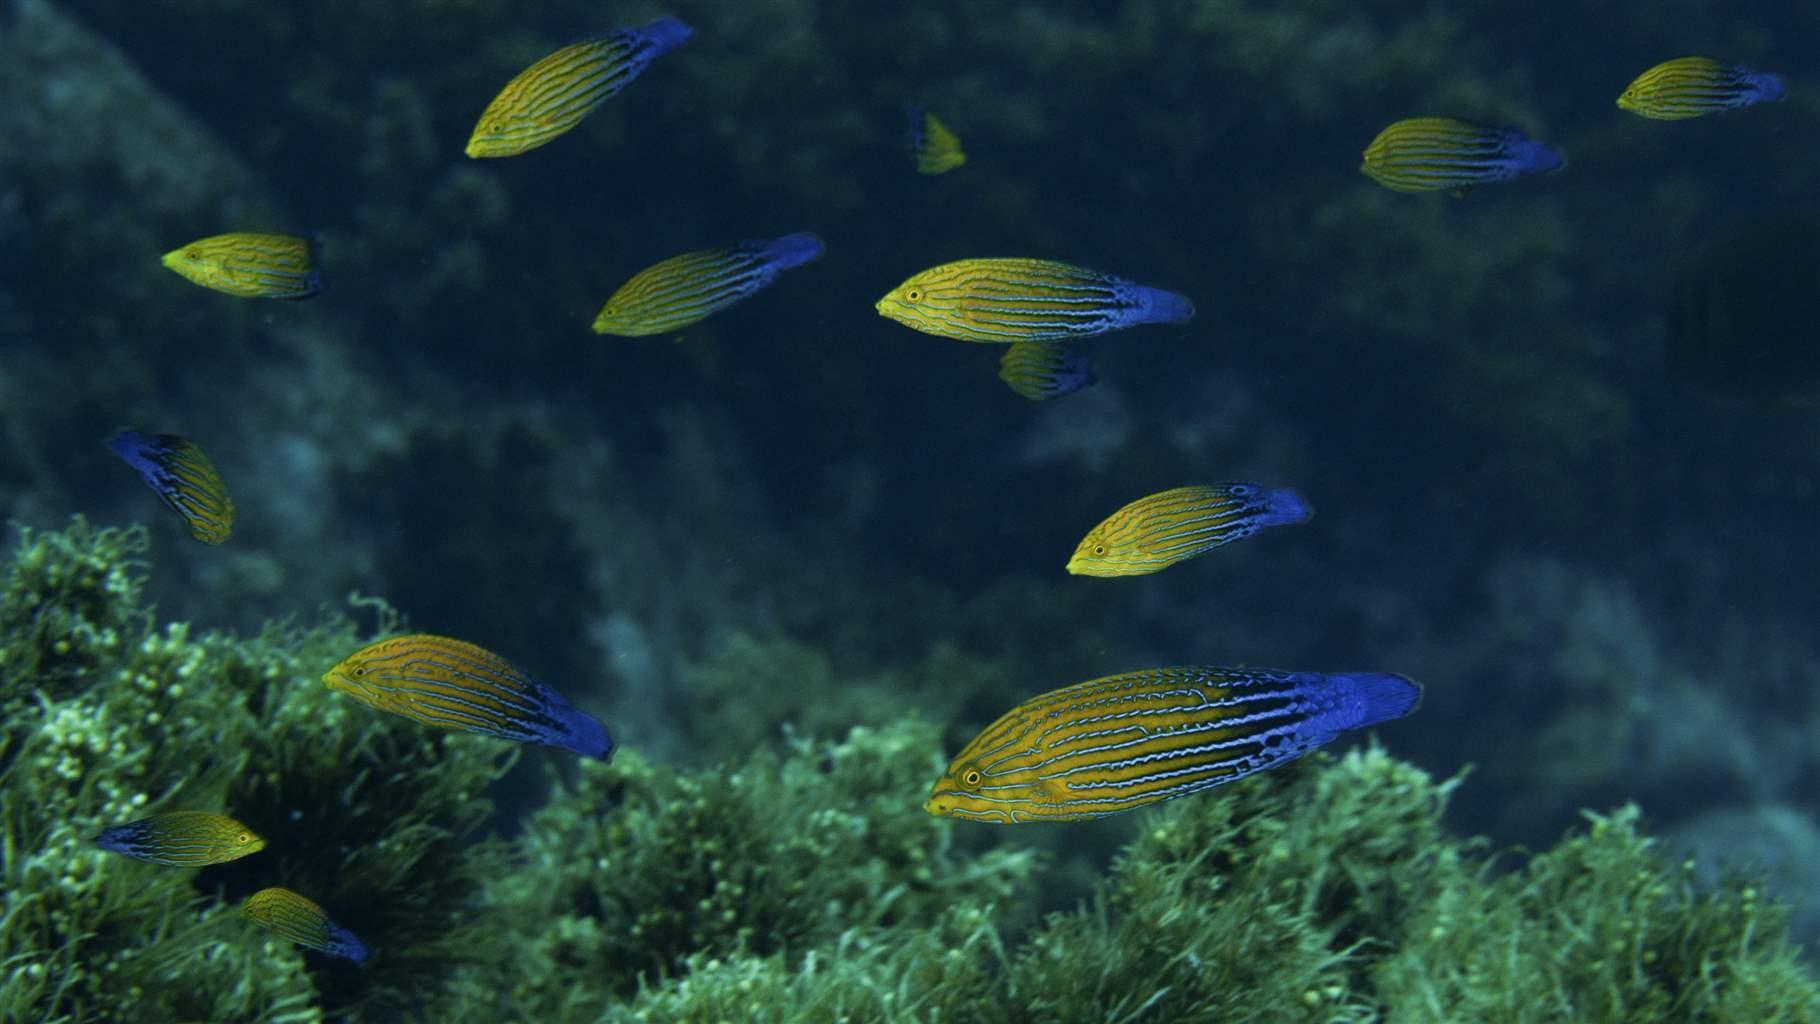 Blue striped tamarin wrasse